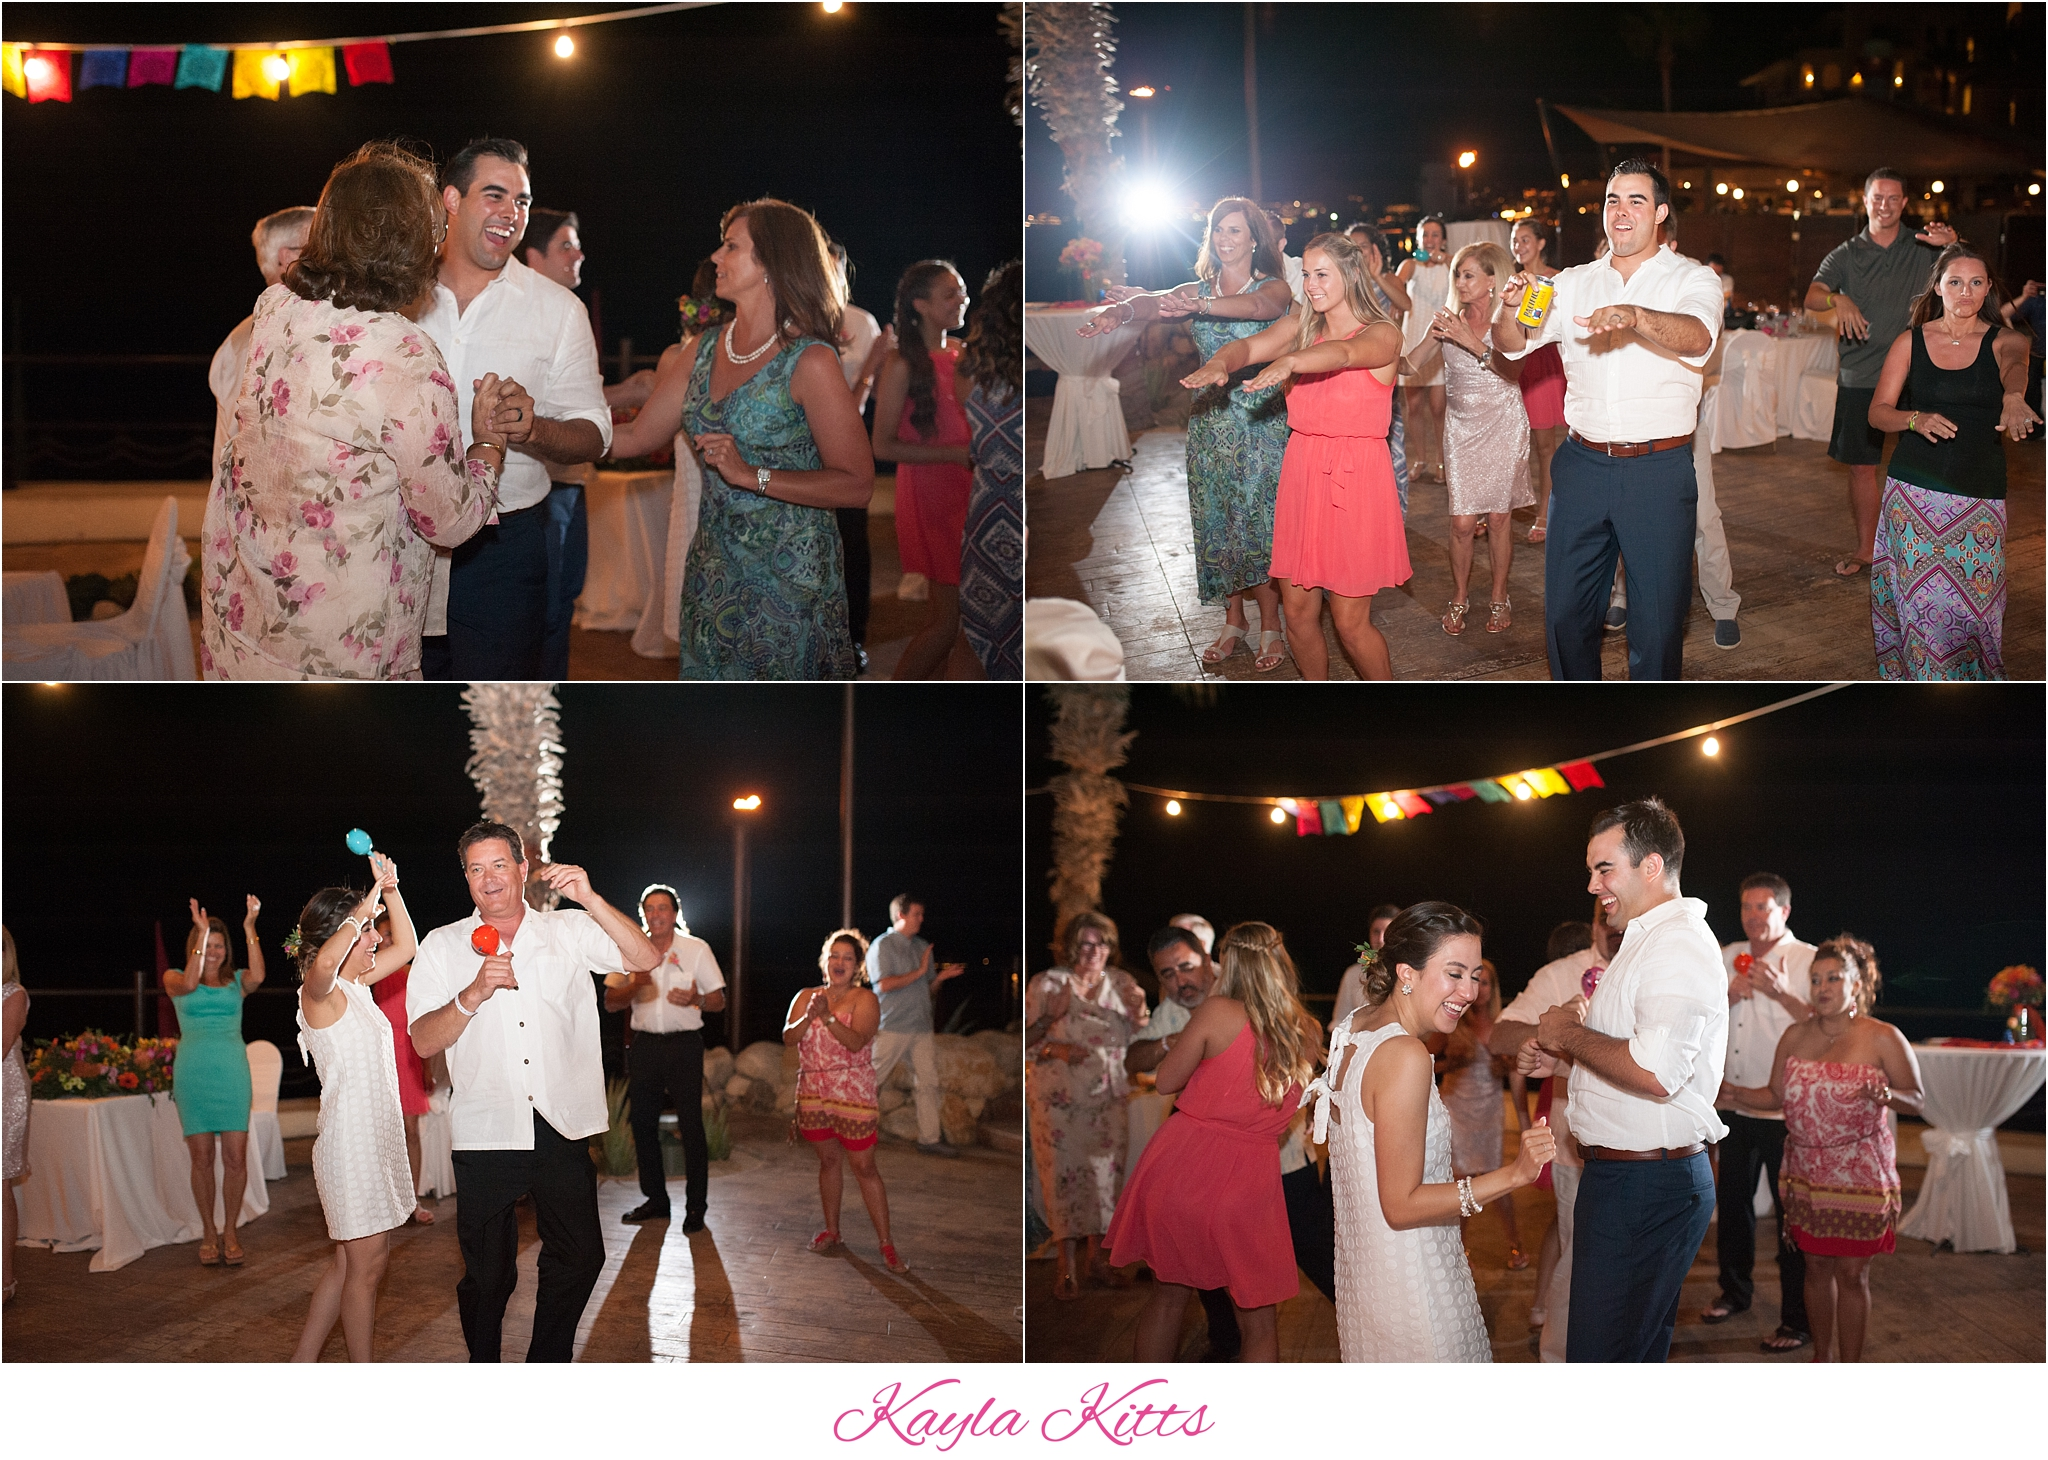 kayla kitts photography-travis and sarah-cabo wedding-cabo wedding photographer-destination wedding photographer-paris wedding photographer-albuquerque wedding-matt jones-albuquerque wedding vendor-intimate wedding_0039.jpg